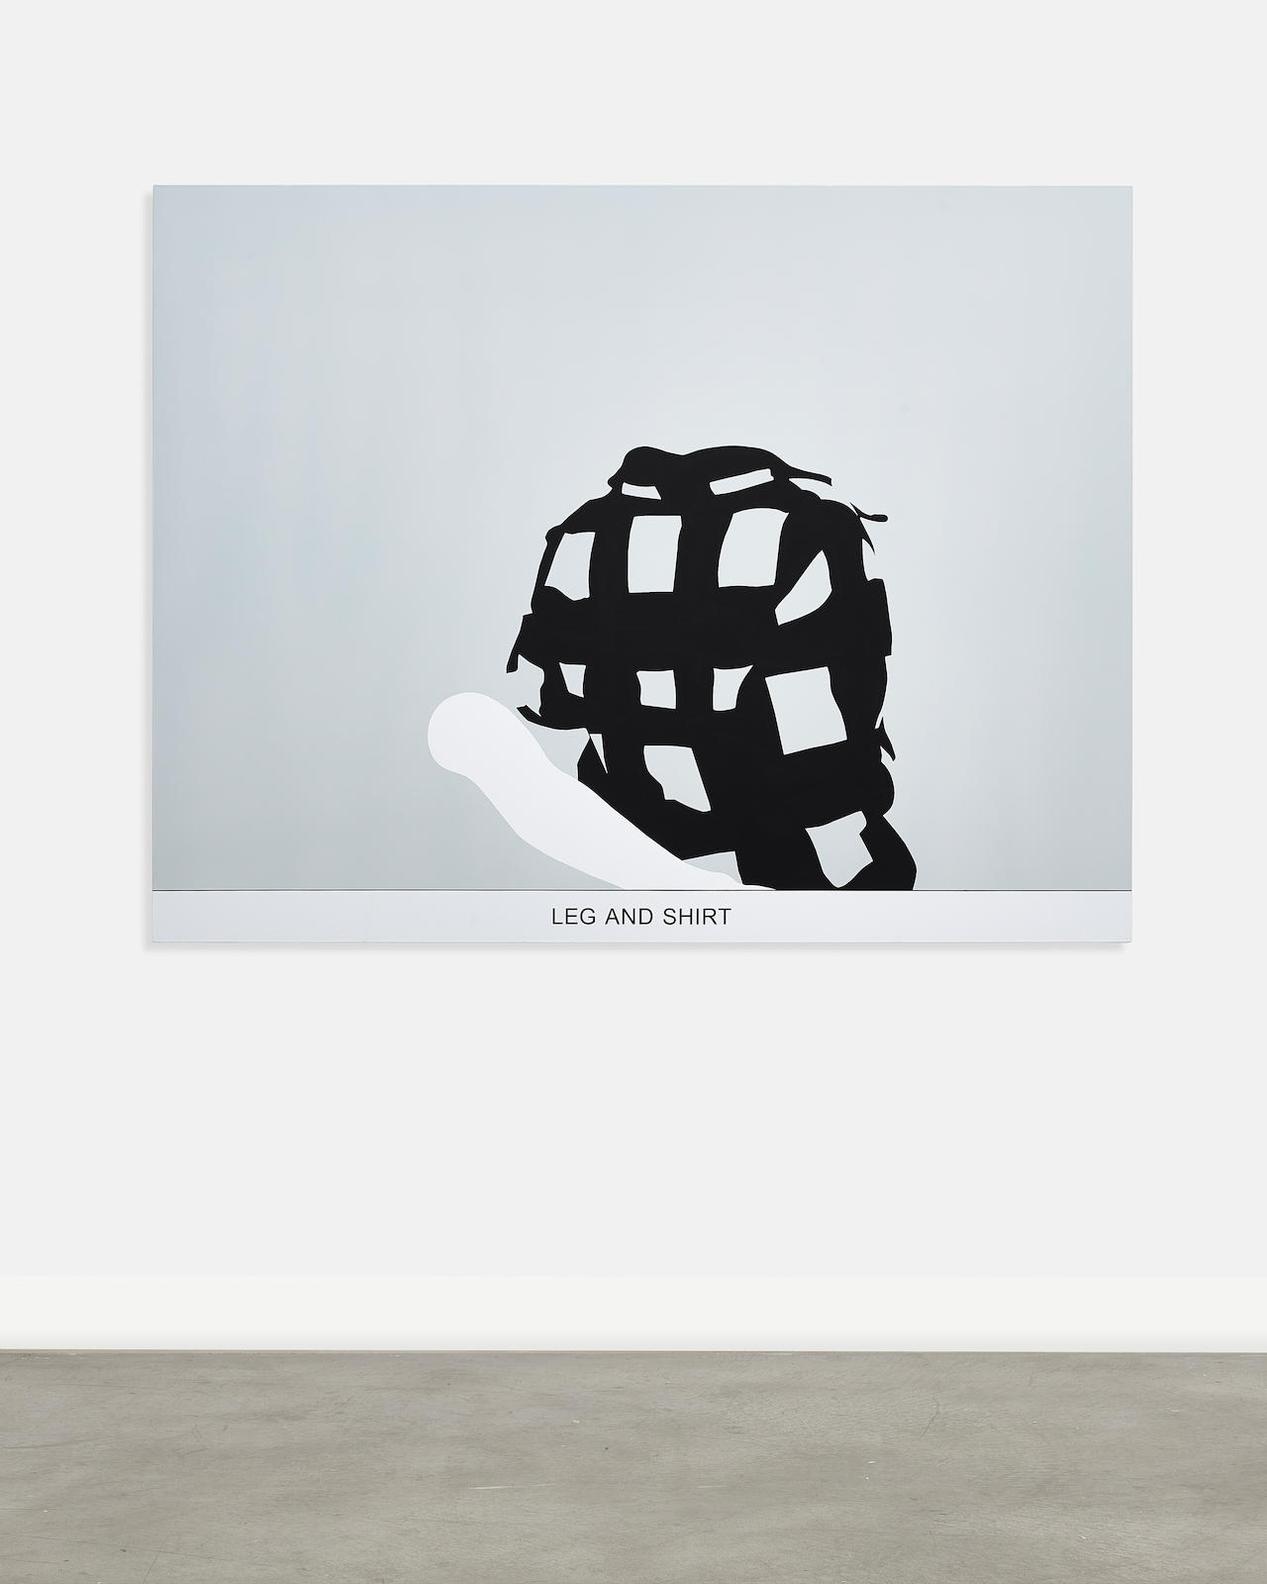 John Baldessari-Sediment: Leg And Shirt-2010